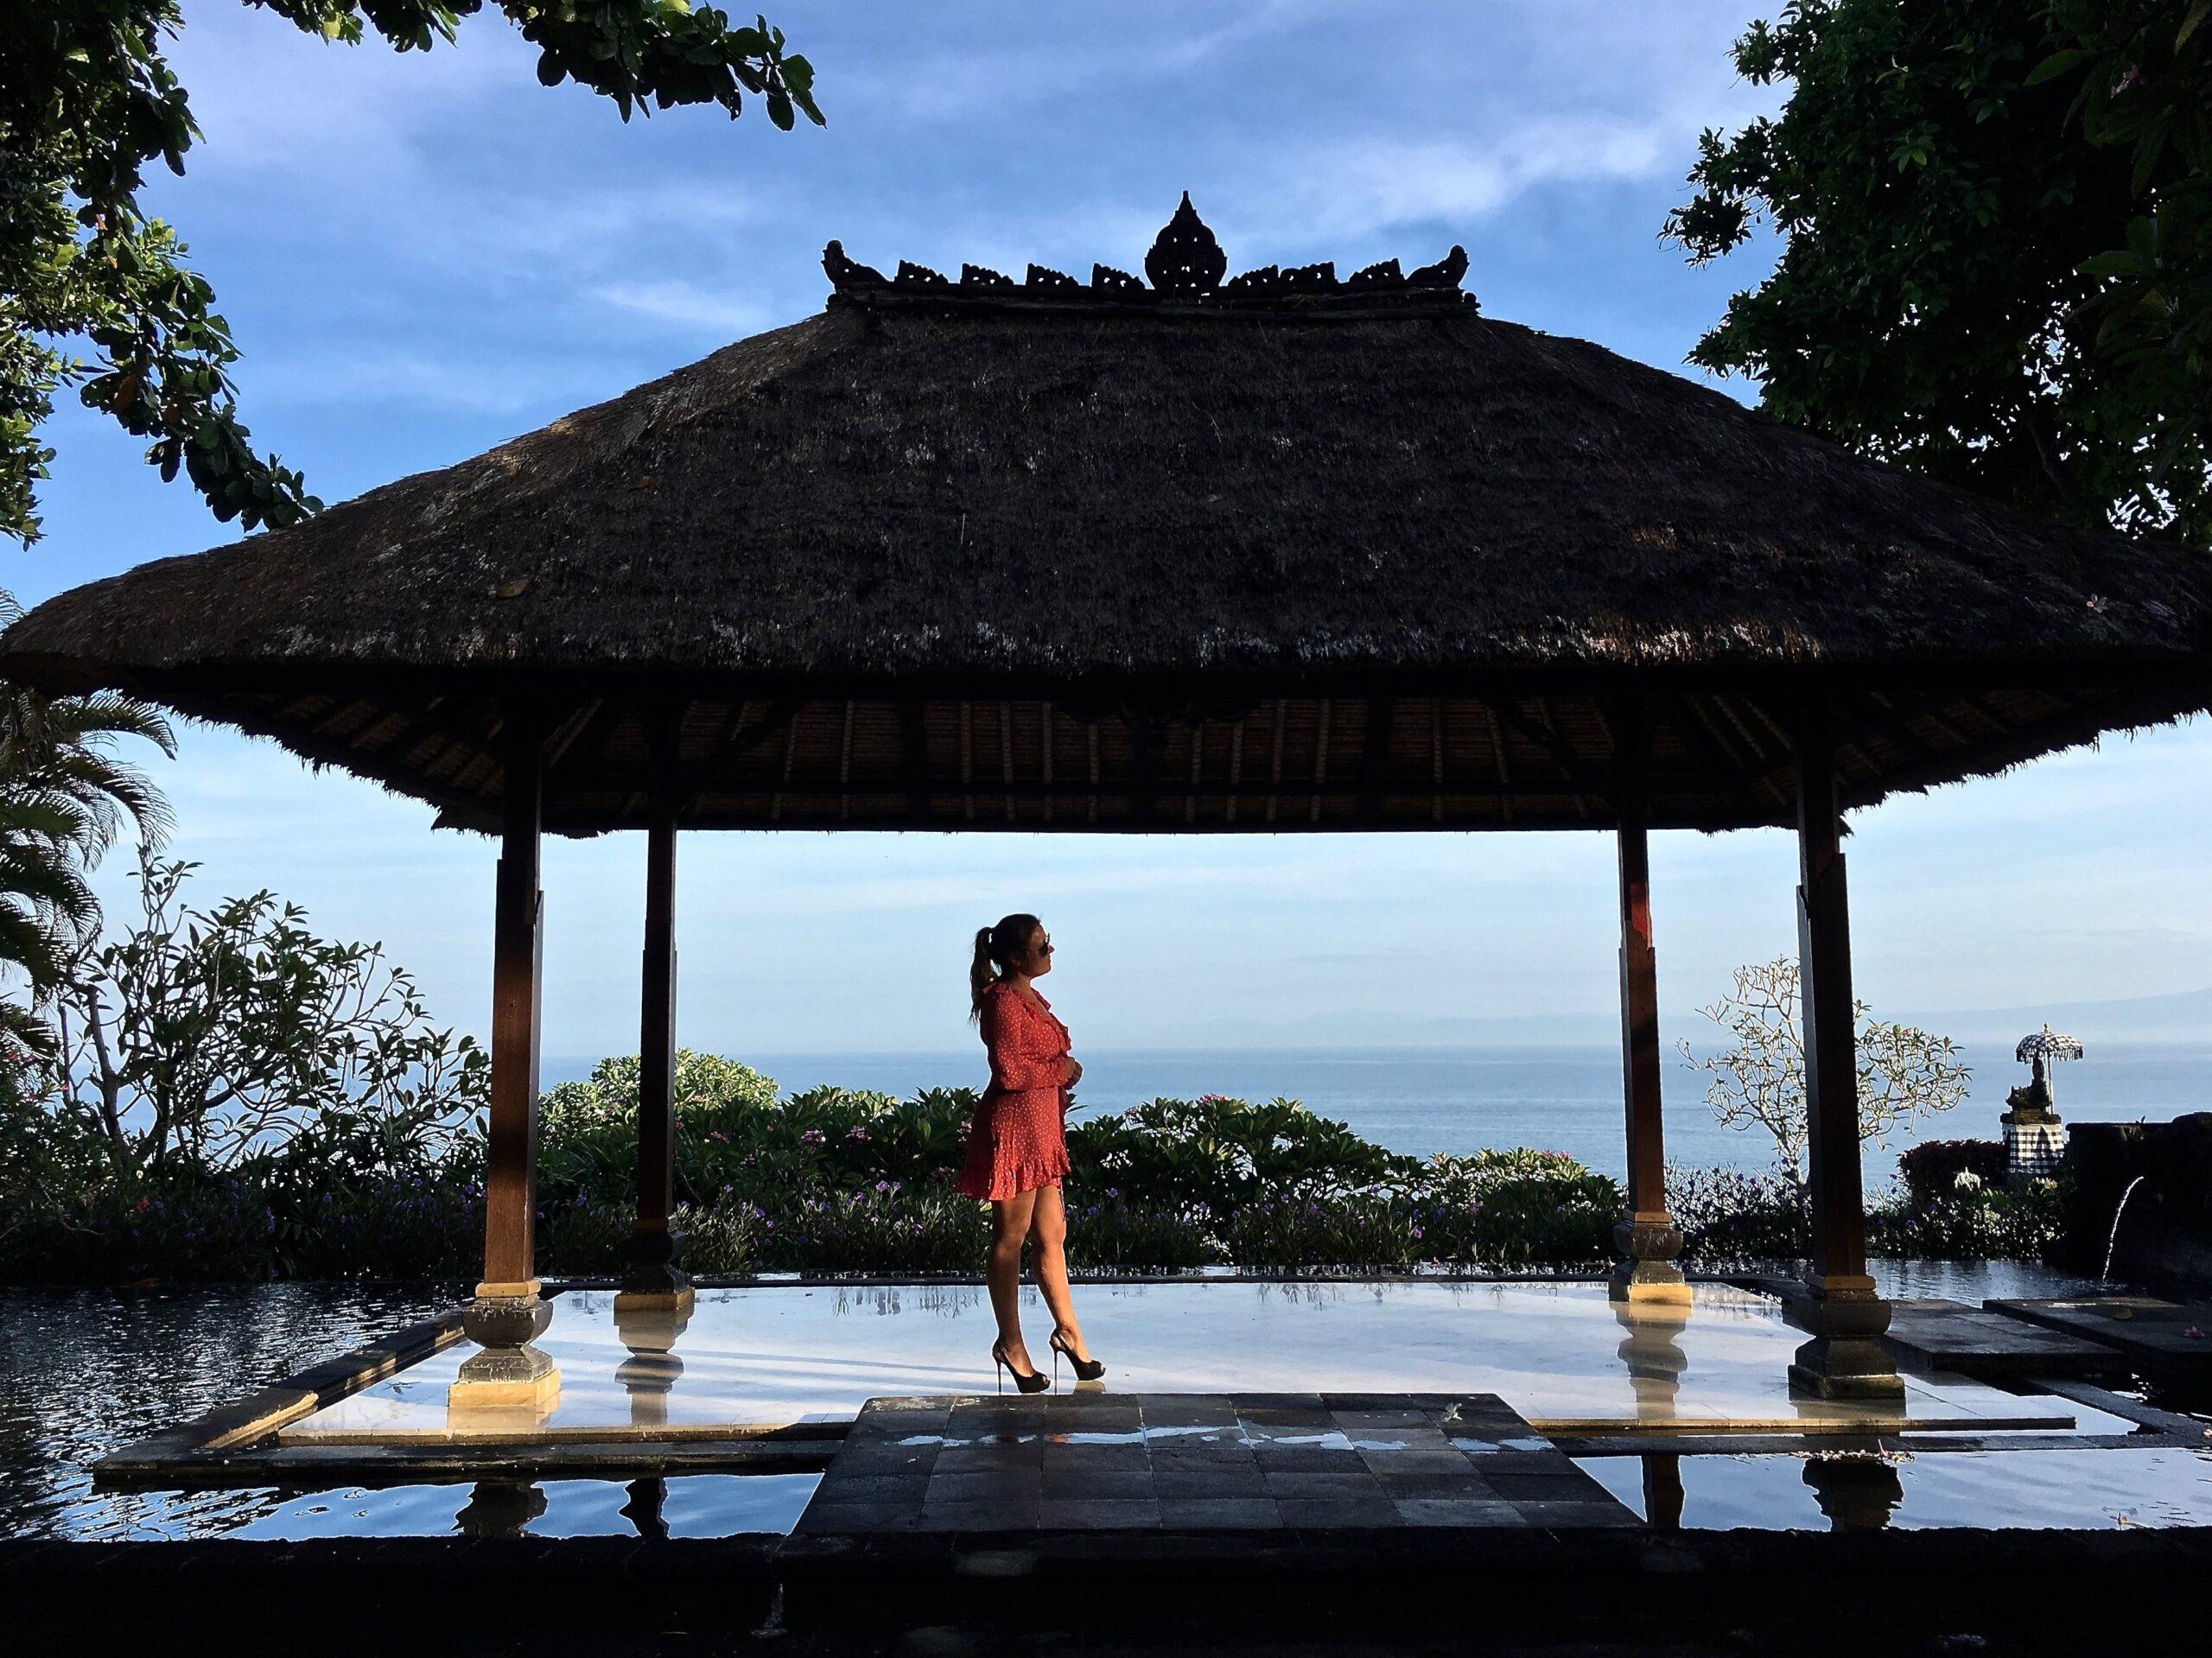 Et tropisk luksus resort på Bali!